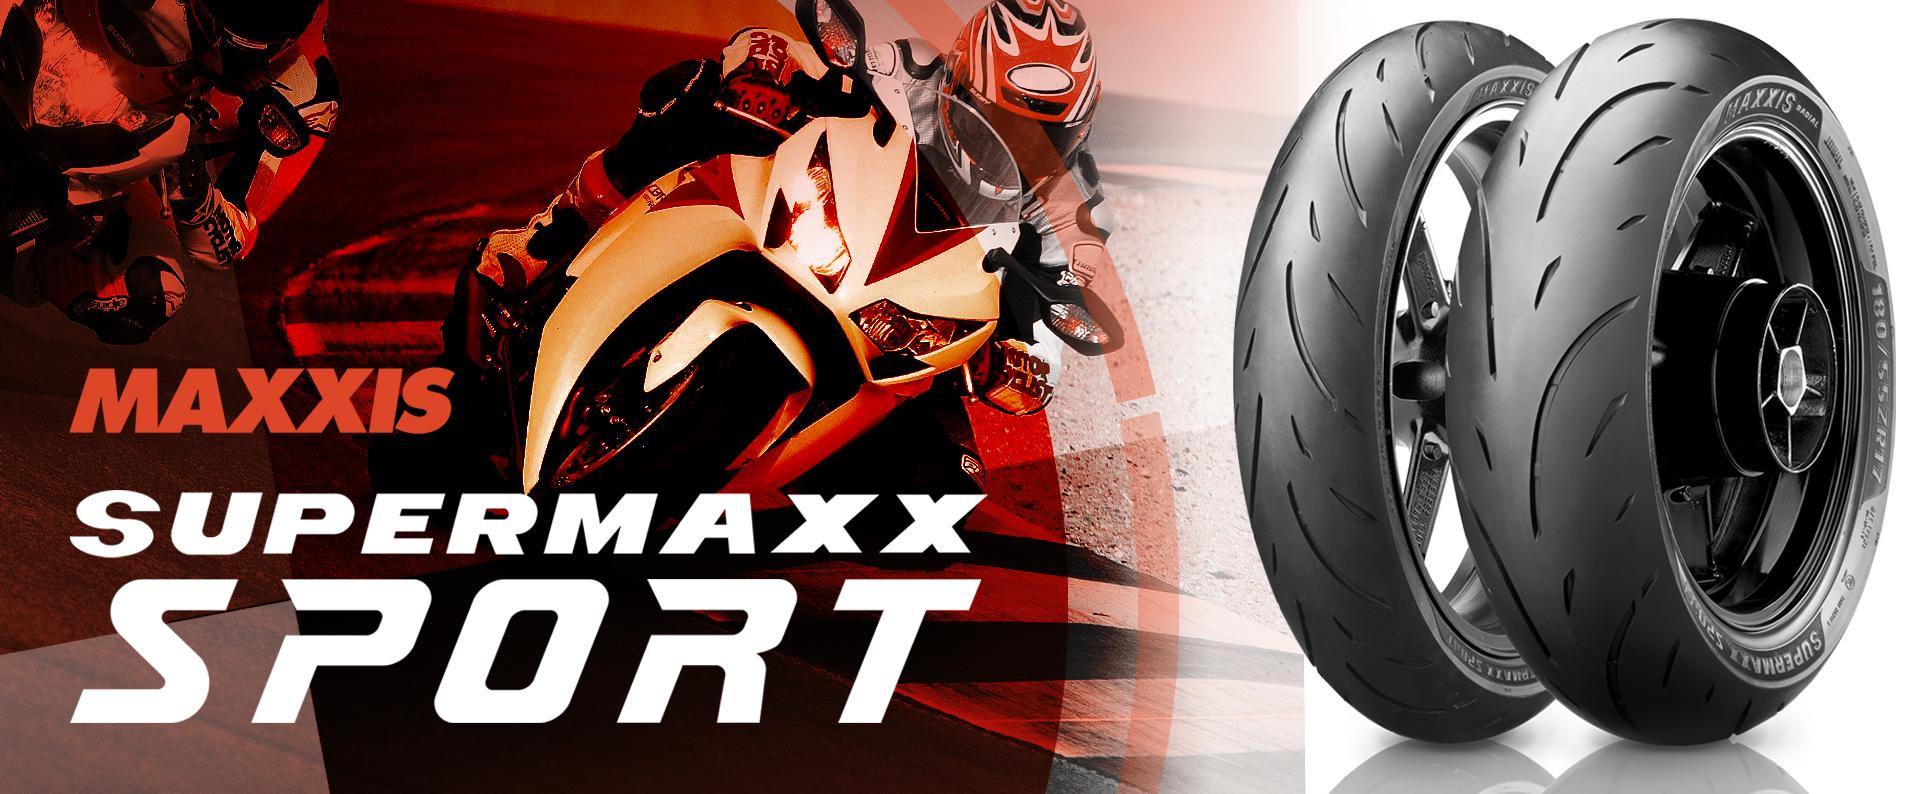 Supermaxx-Sport-web-banner-1920x794-v2